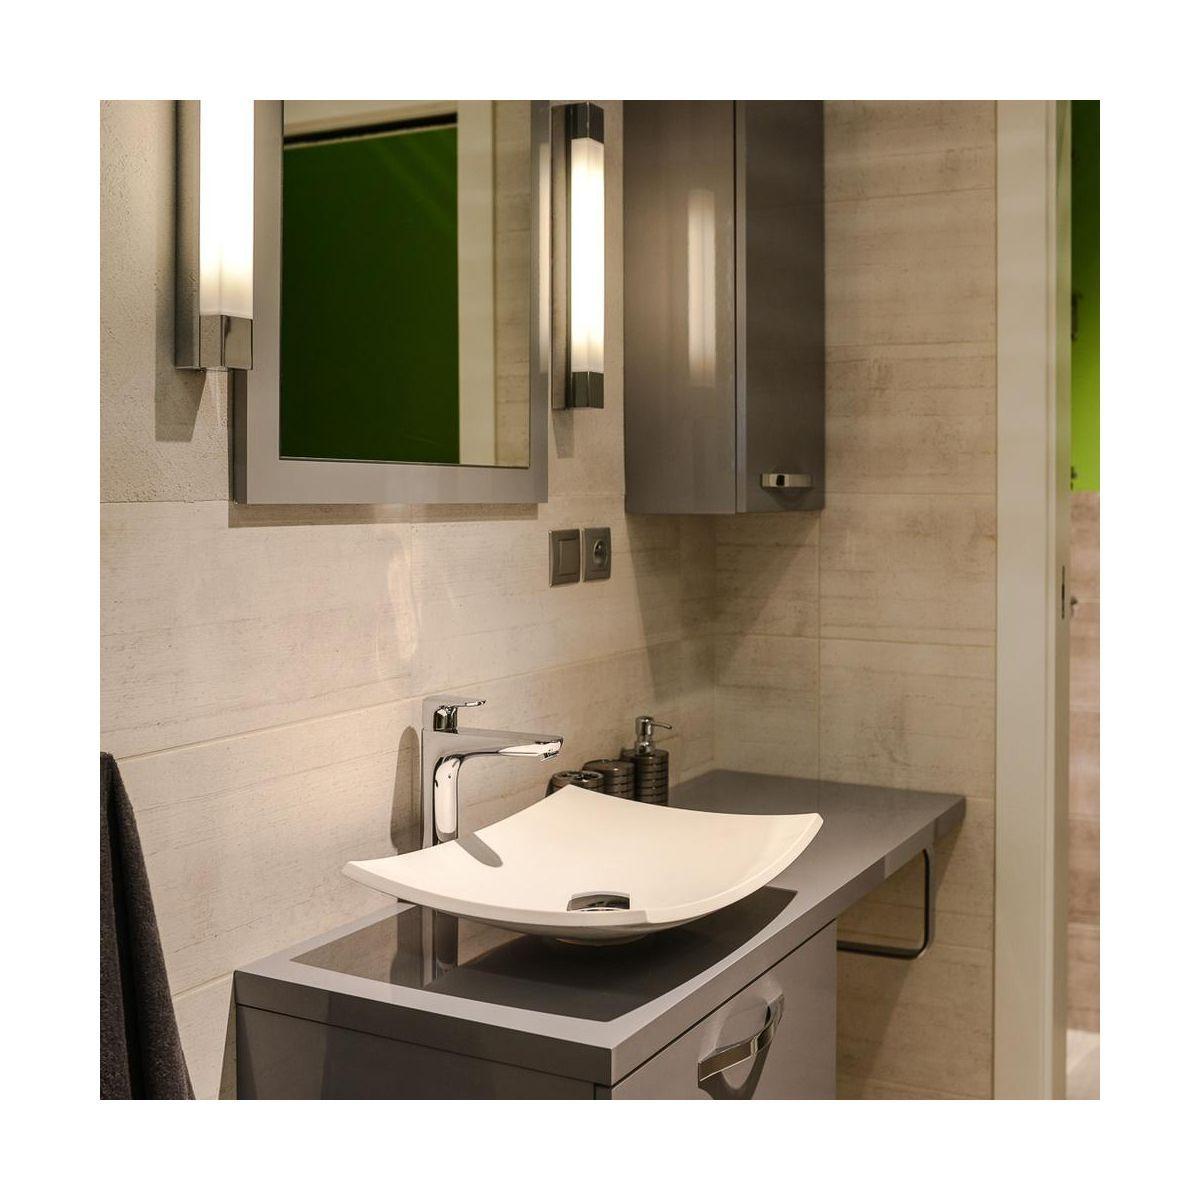 Top Solid Umywalka Natura 500c Bathroom Mirror Lighted Bathroom Mirror Bathroom Lighting